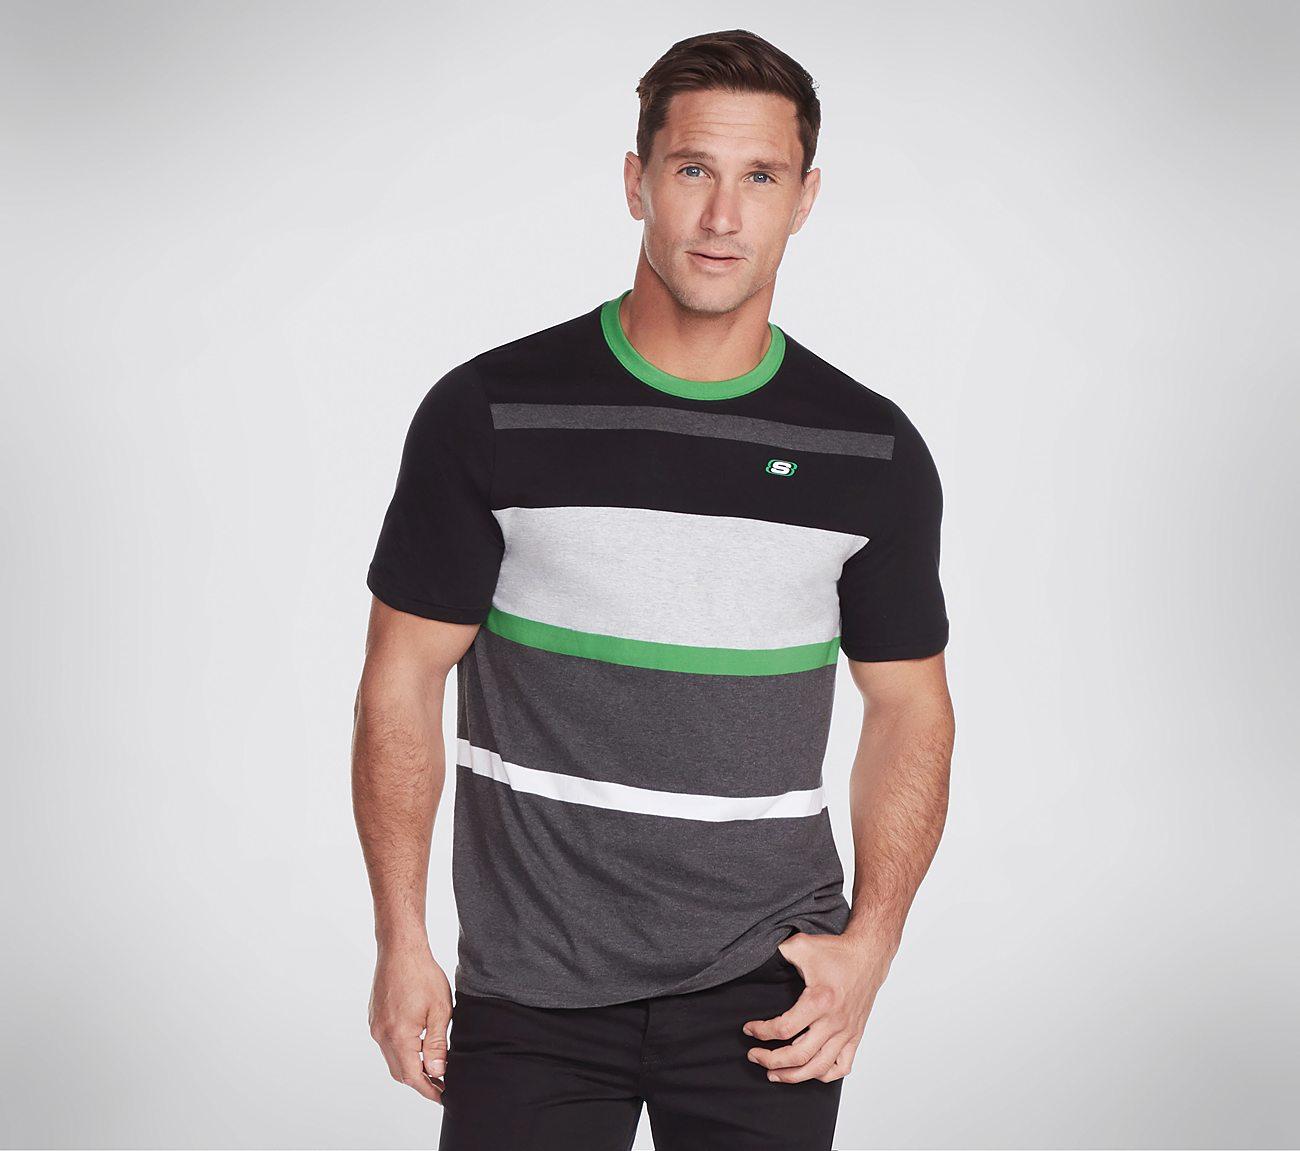 Skechers Apparel Mountain View Stripe Tee Shirt